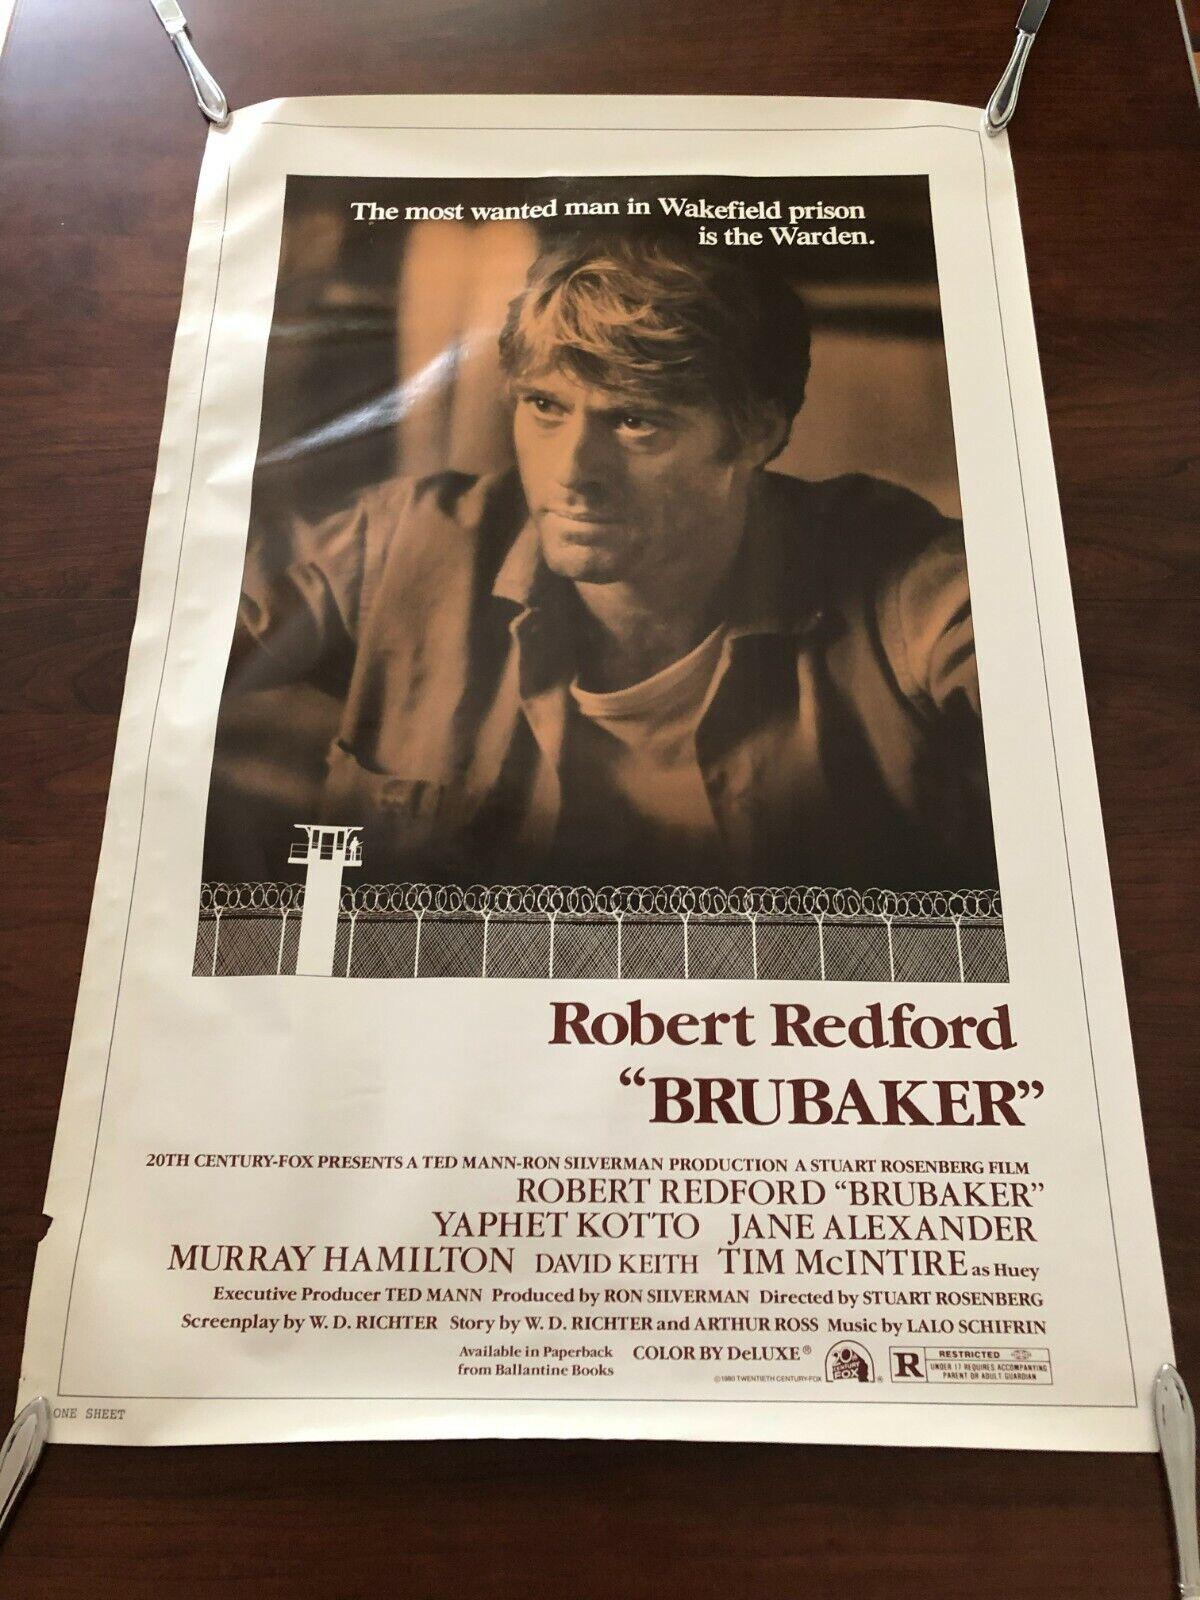 1980 ROBERT REDFORD BRUBAKER ONE SHEET 20TH CENTURY ORIGINAL POSTER - $7.90